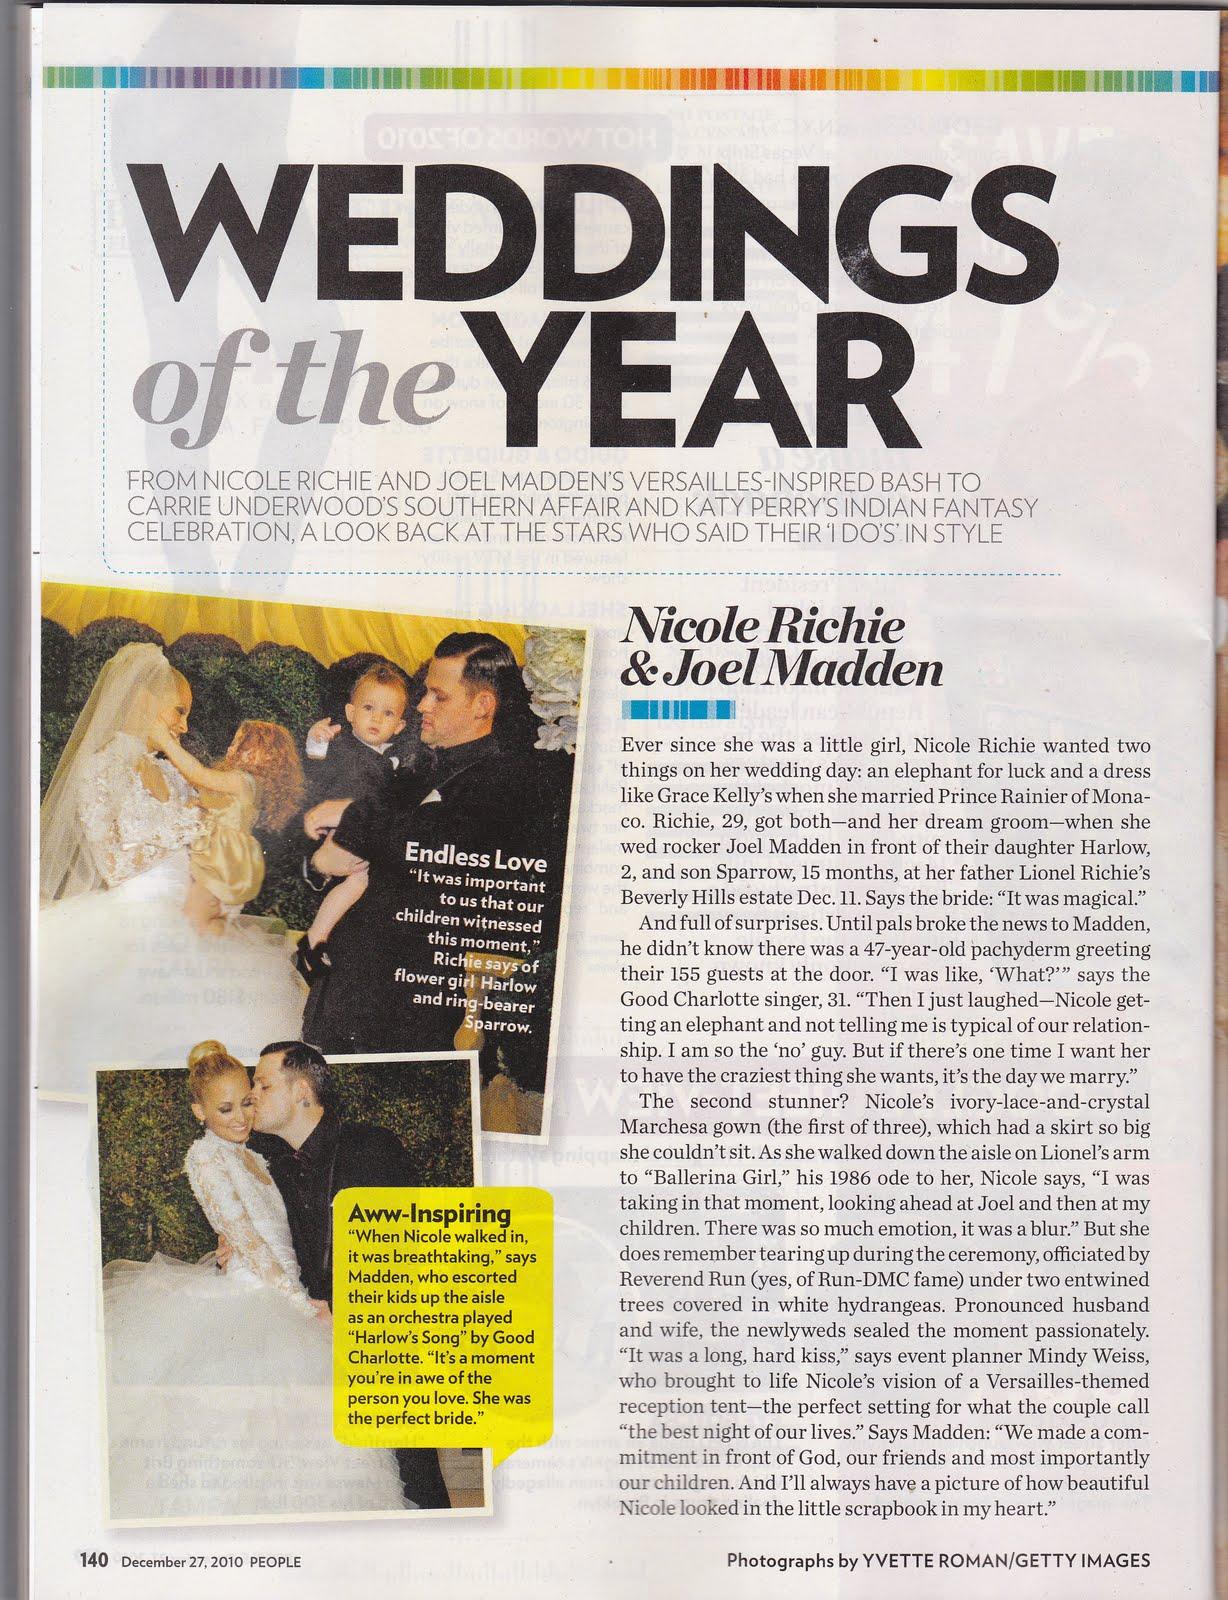 http://2.bp.blogspot.com/_ygRAqJeep-s/TQyu2PyzKUI/AAAAAAAAHe4/_9ZnQEp9oqE/s1600/nicole-richie-joel-madden-people-magazine-wedding.jpg